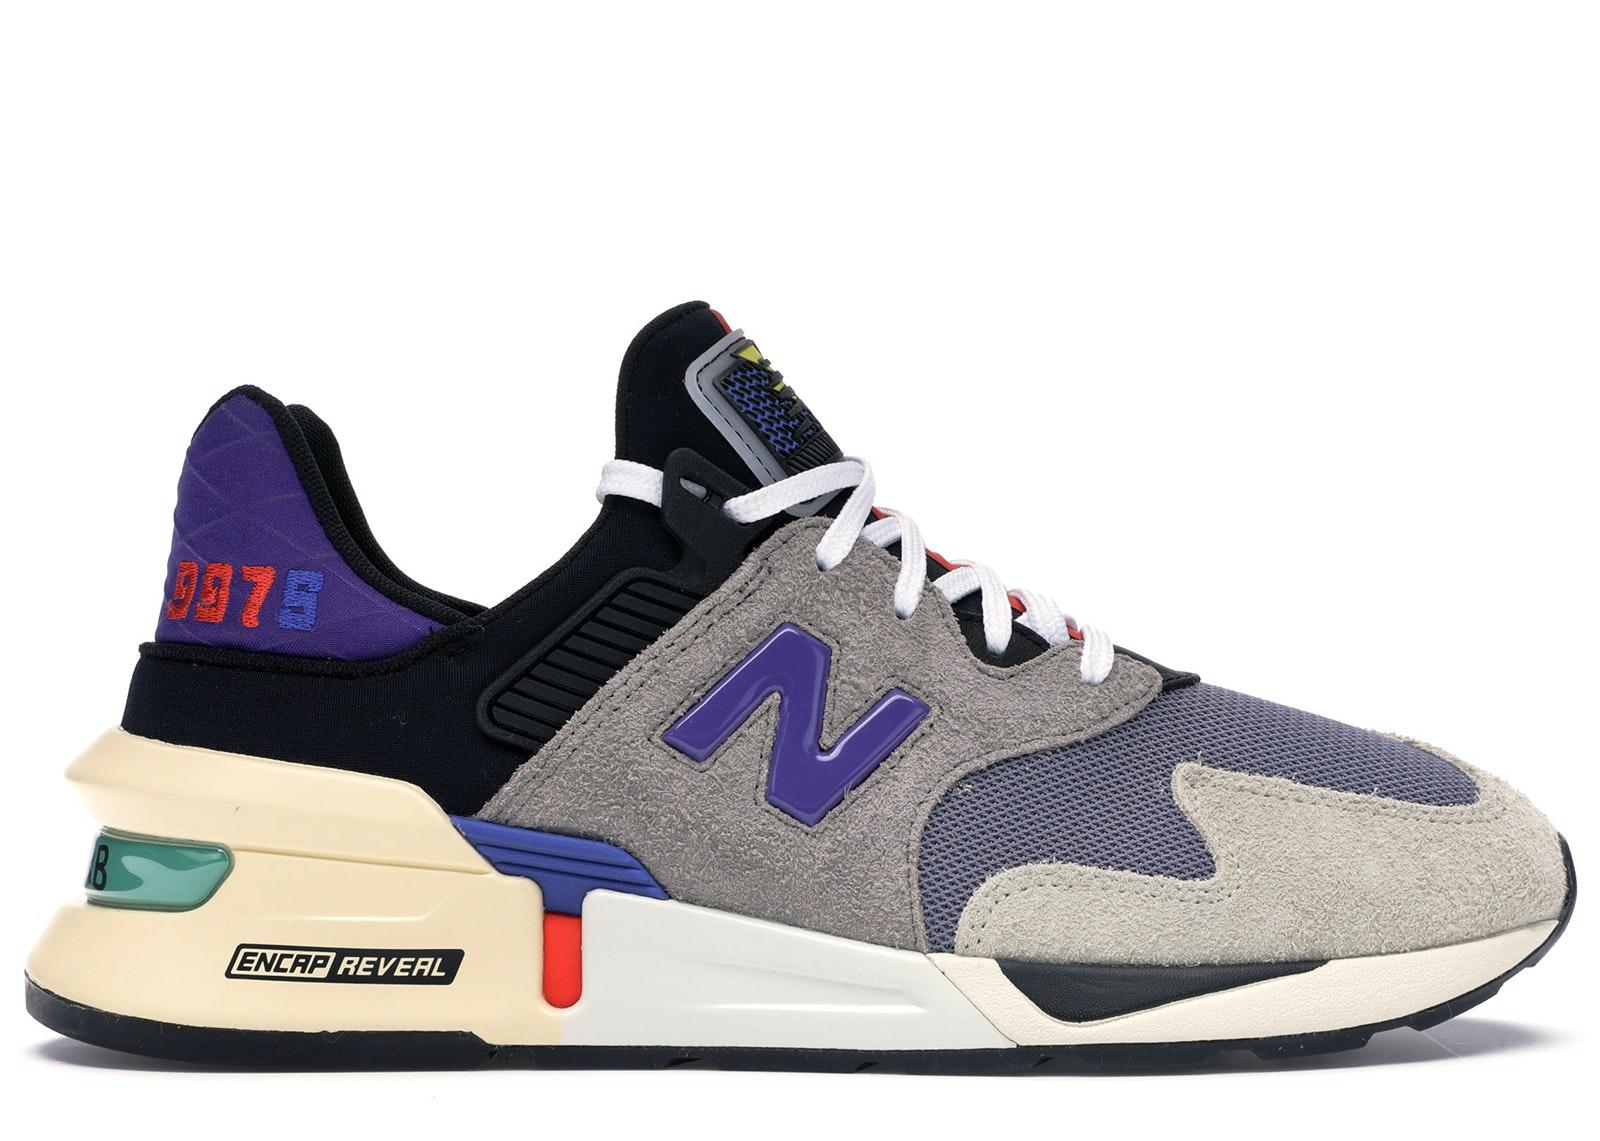 New Balance 997S Bodega